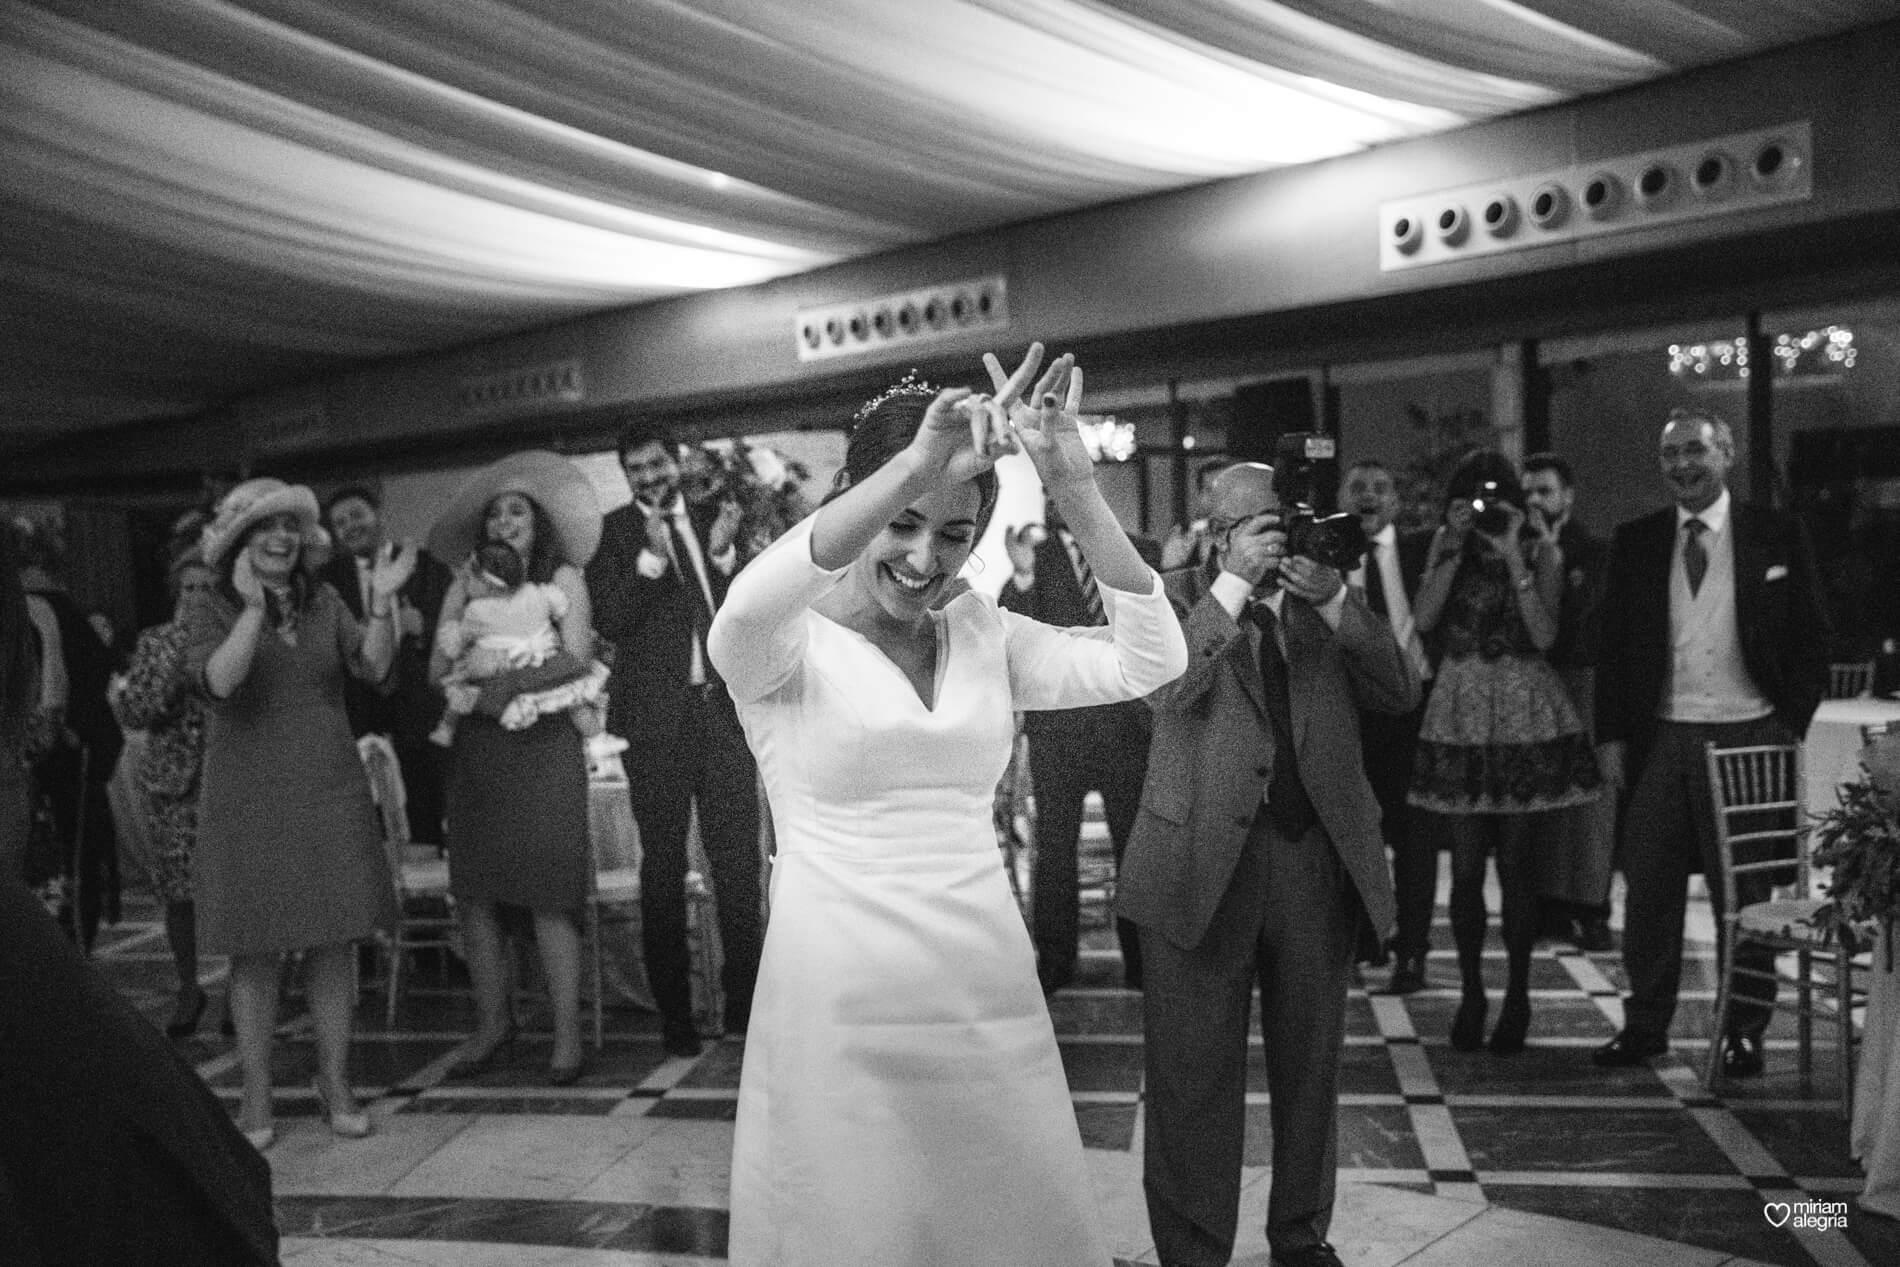 vestido-de-novia-paula-del-vas-miriam-alegria-fotografos-boda-murcia-134